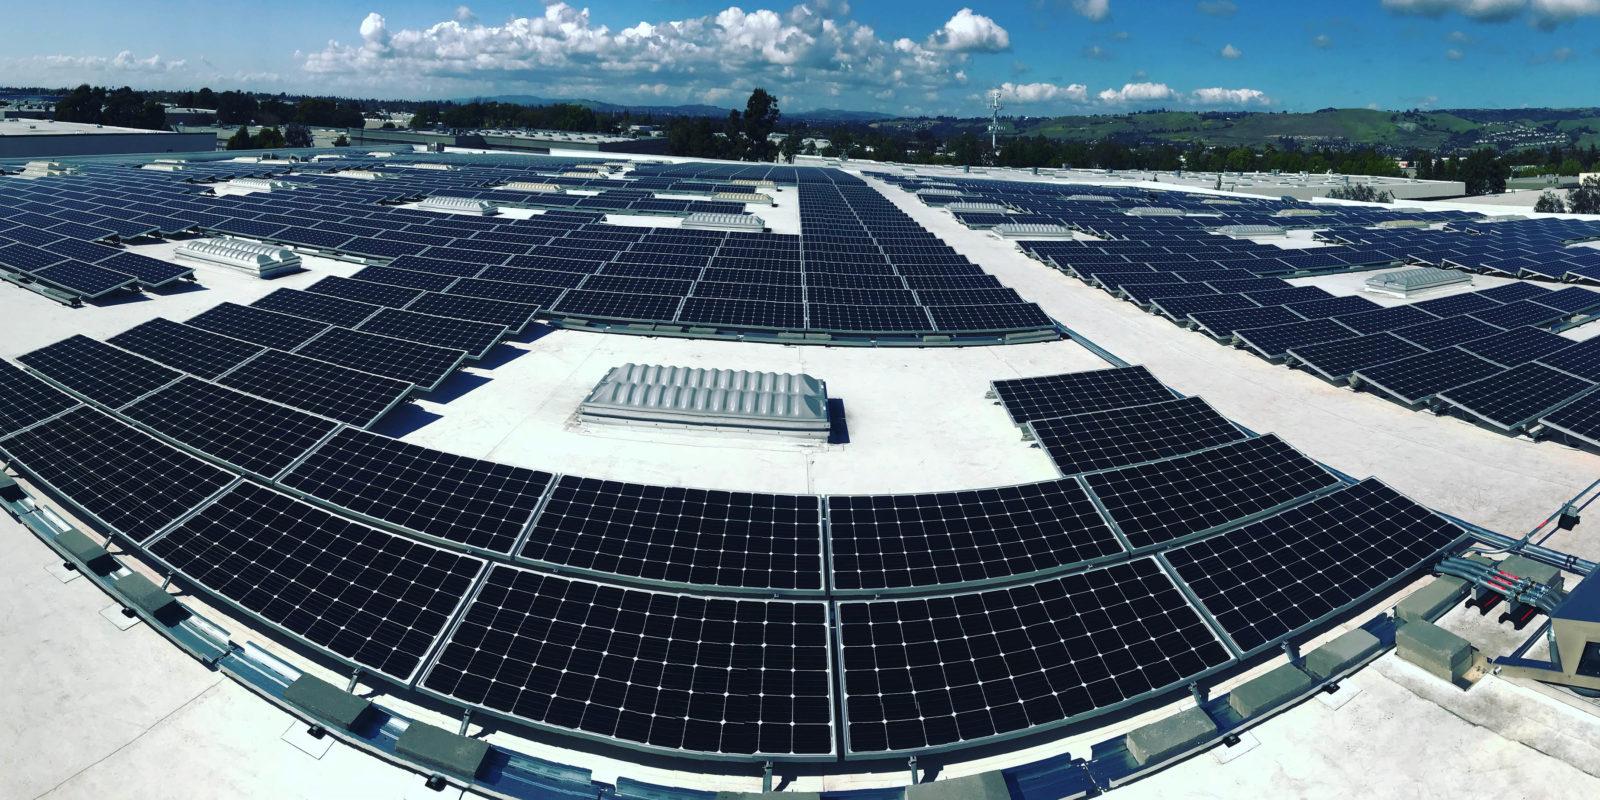 Borrego Solar Systems Completes Third Roof-Mounted Solar Array for Coast Citrus Distributors